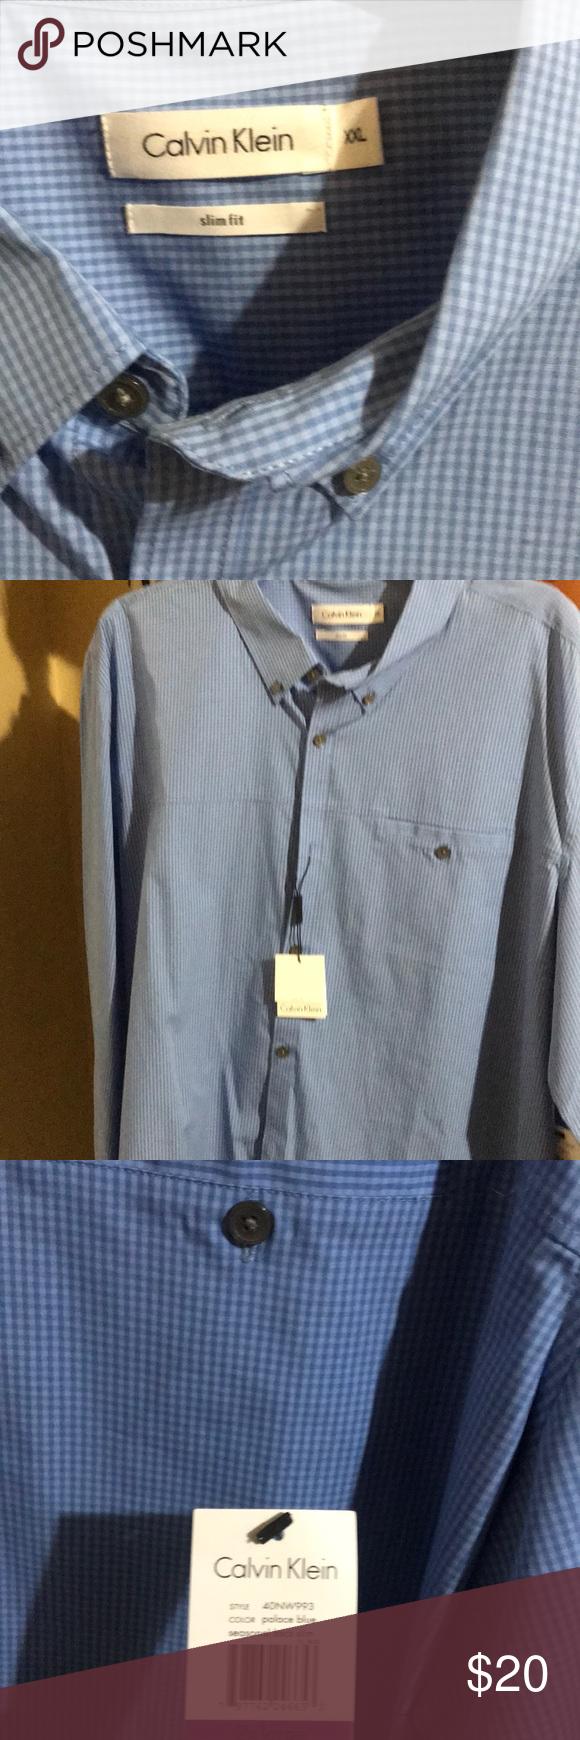 Calvin Klein Blue Dress Shirt Slim Fit Nwt Calving Klein Long Sleeve Light Blue Dress Shirt Wi Calvin Klein Blue Dress Blue Shirt Dress Light Blue Dress Shirt